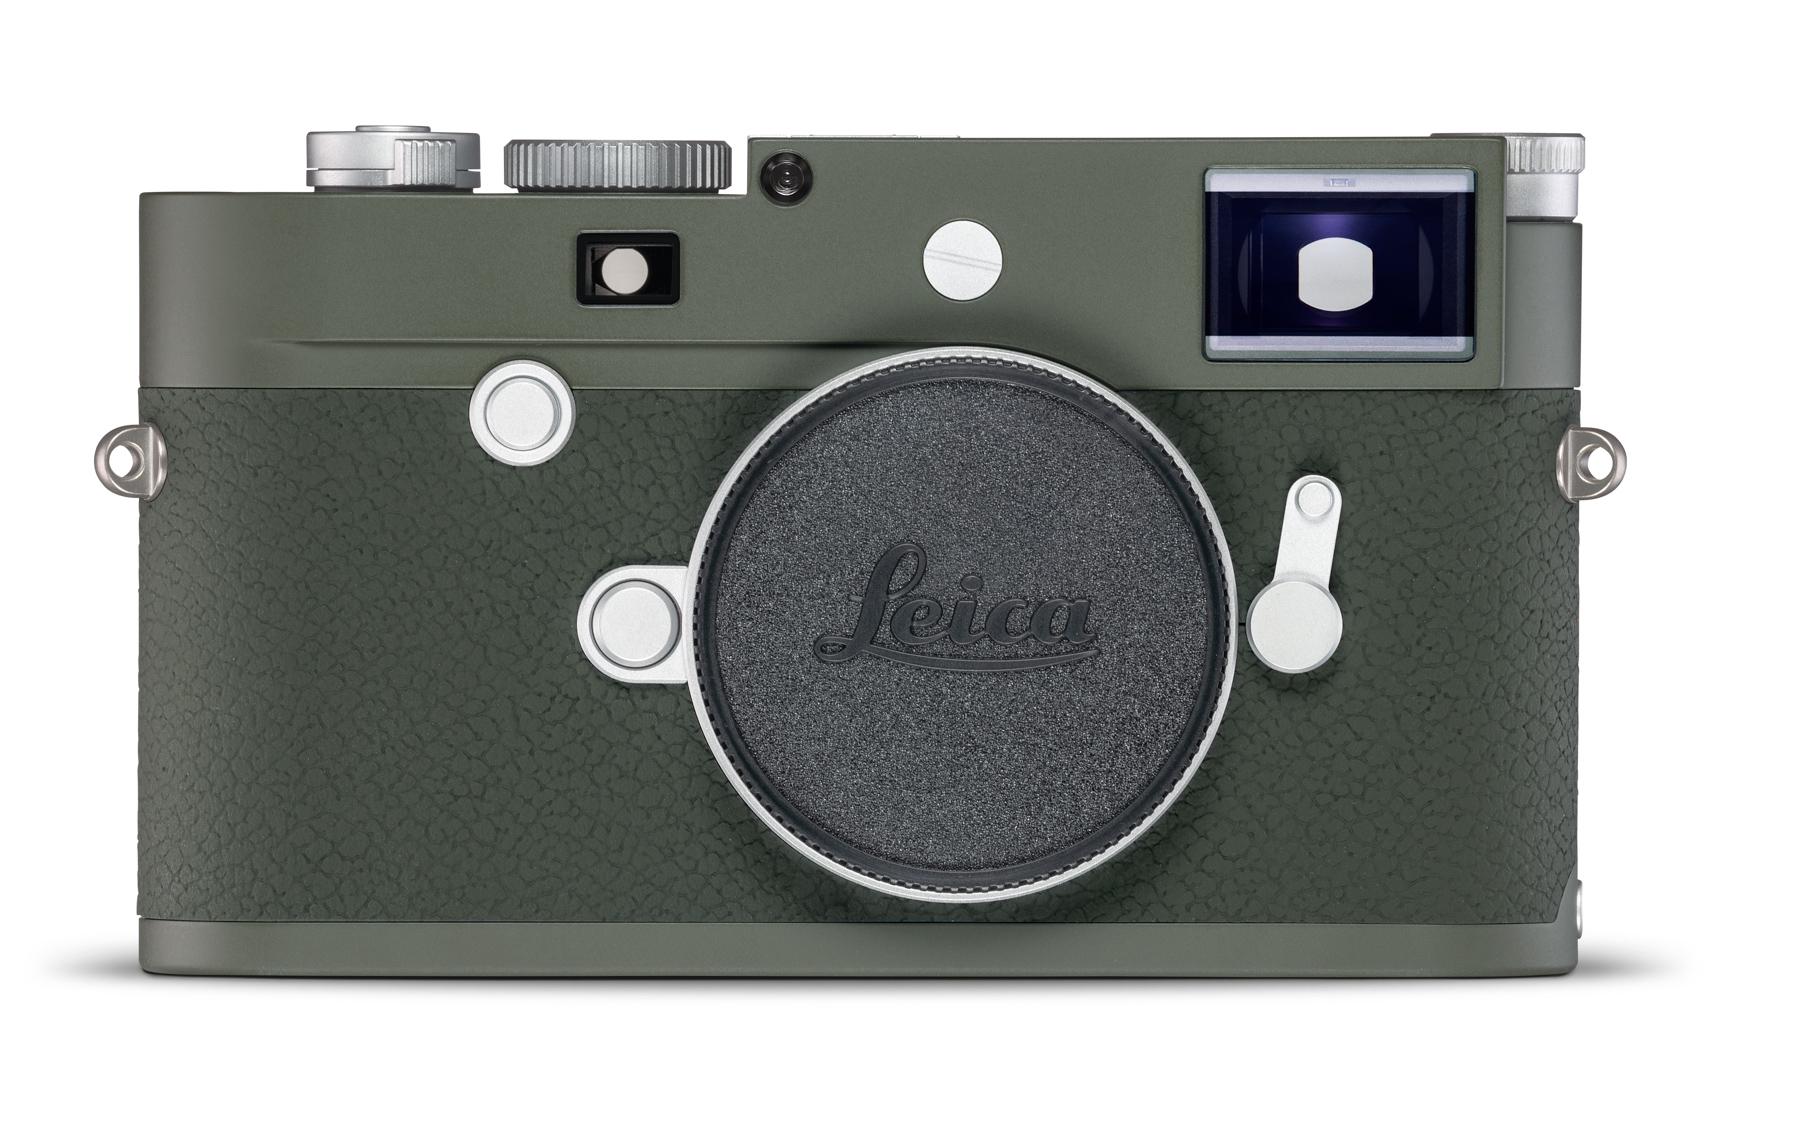 Leica Announces M10-P & 50mm f/2 'Safari' Editions